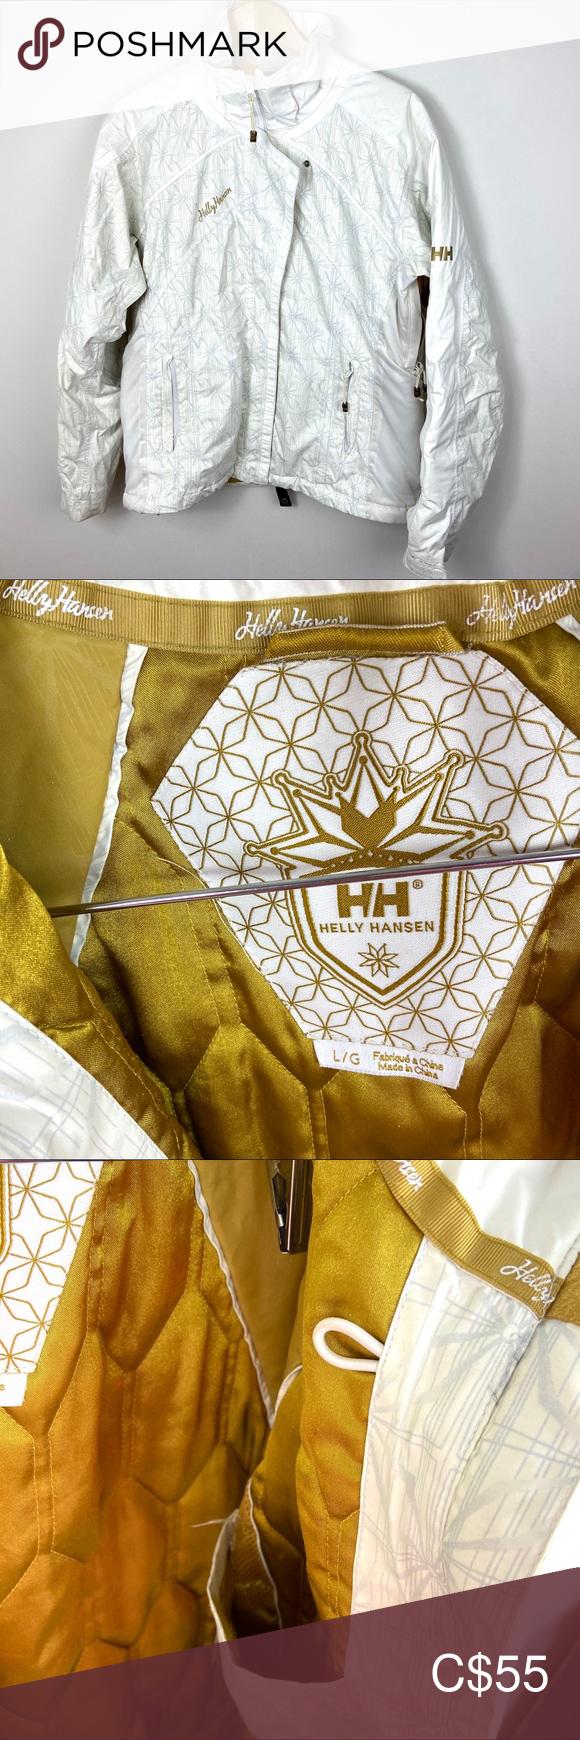 Helly Hansen Women's Ski Jacket White Size Large